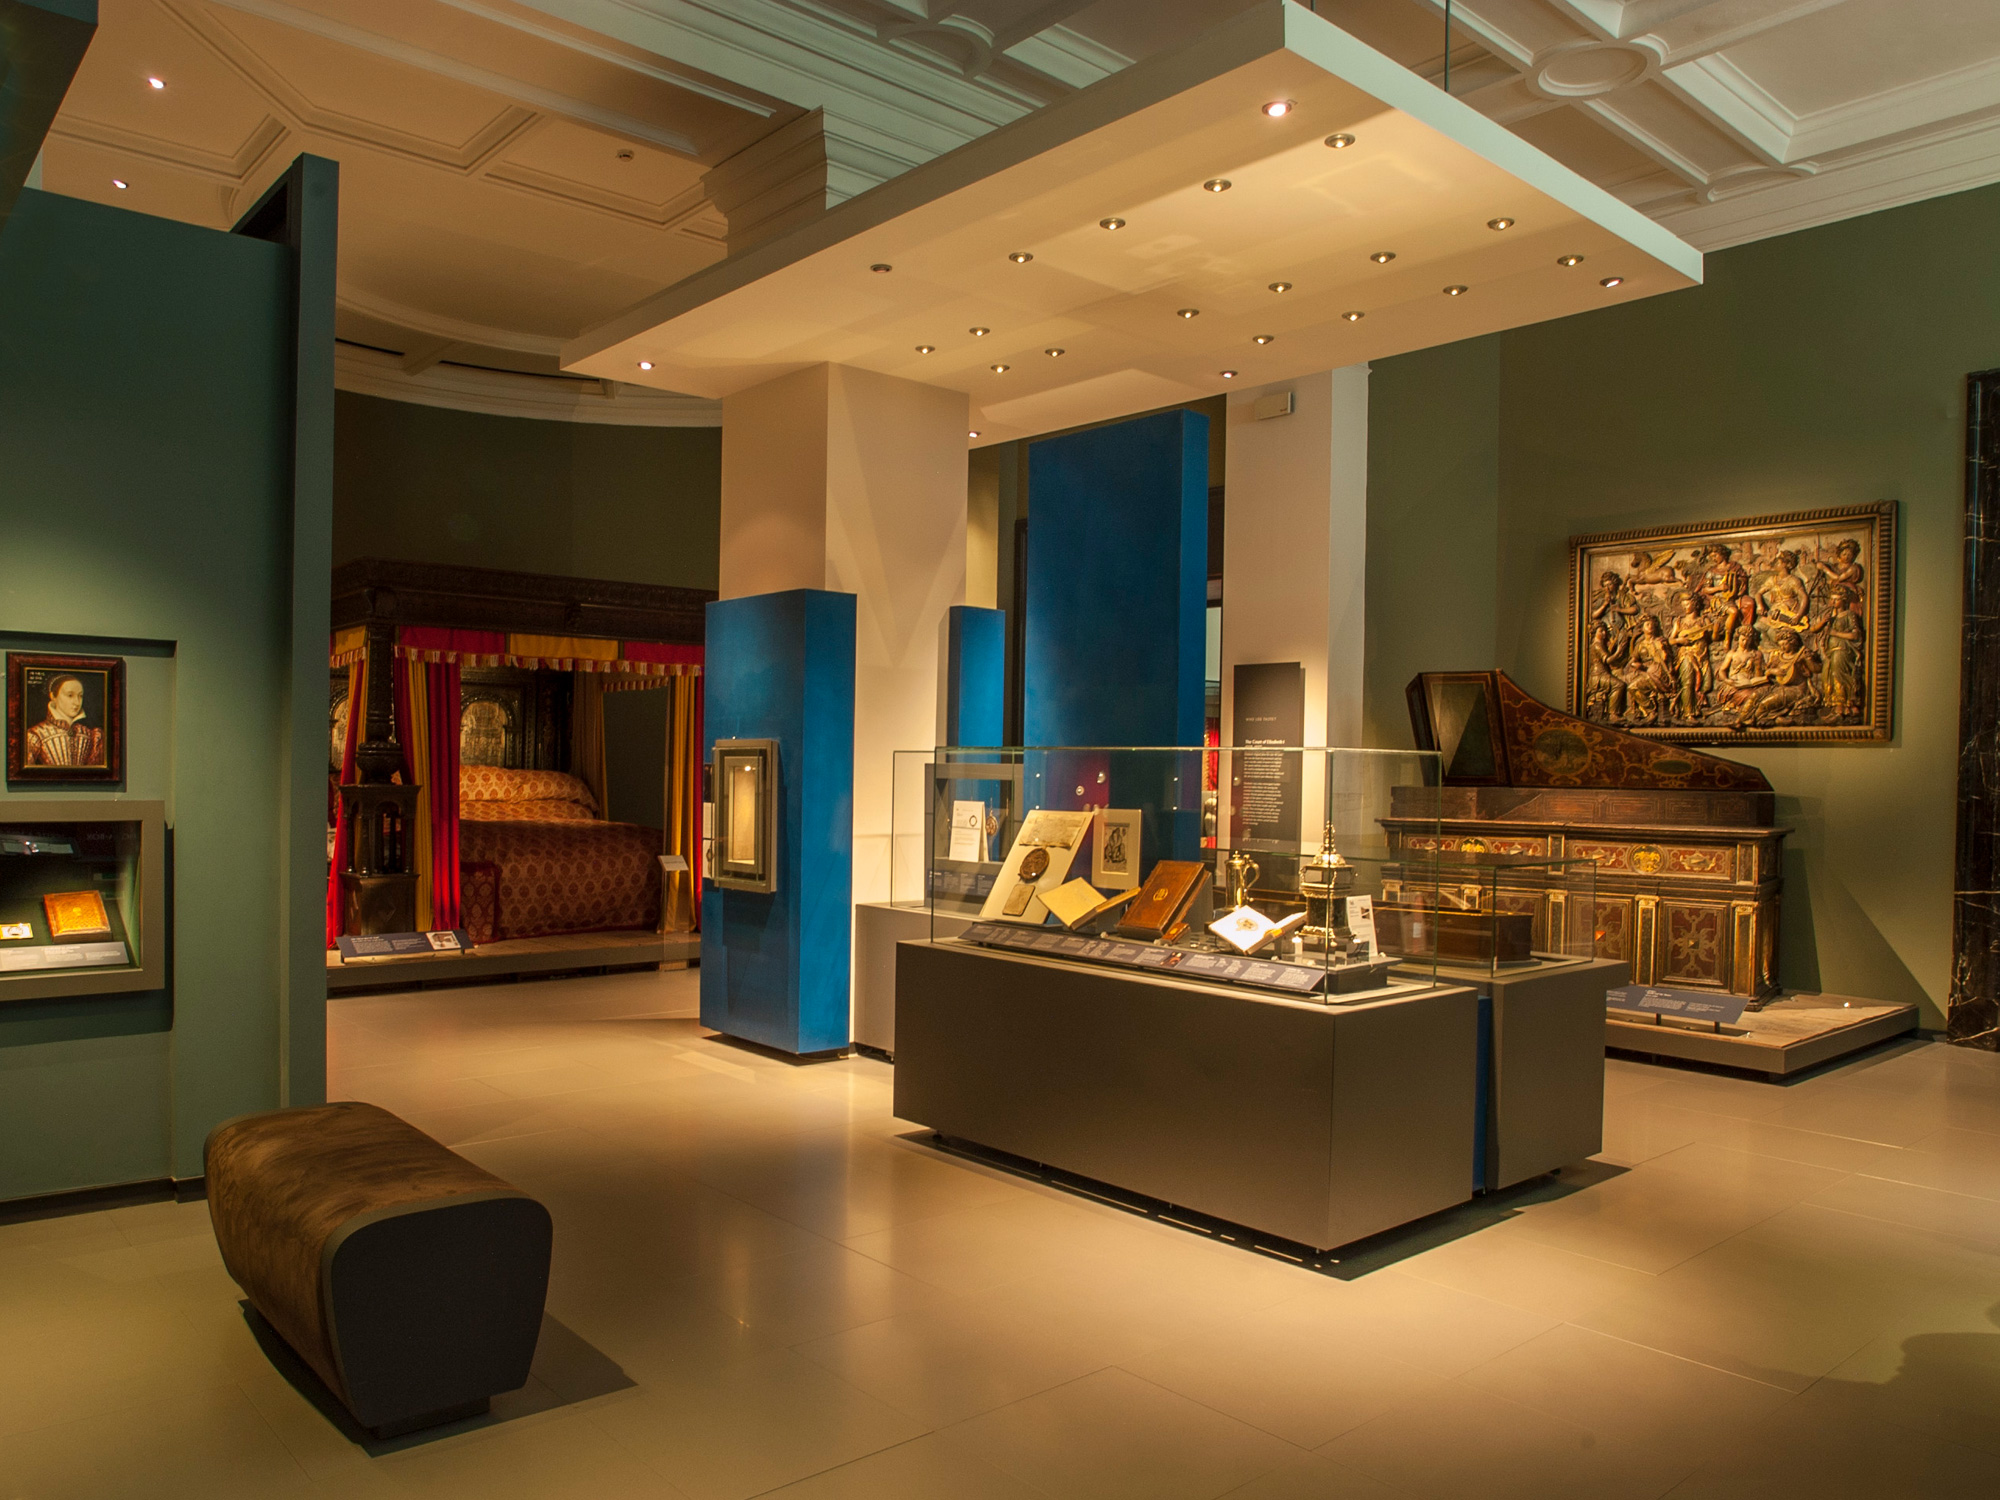 The Great Bed of Ware. British Galleries, Victoria & Albert Museum